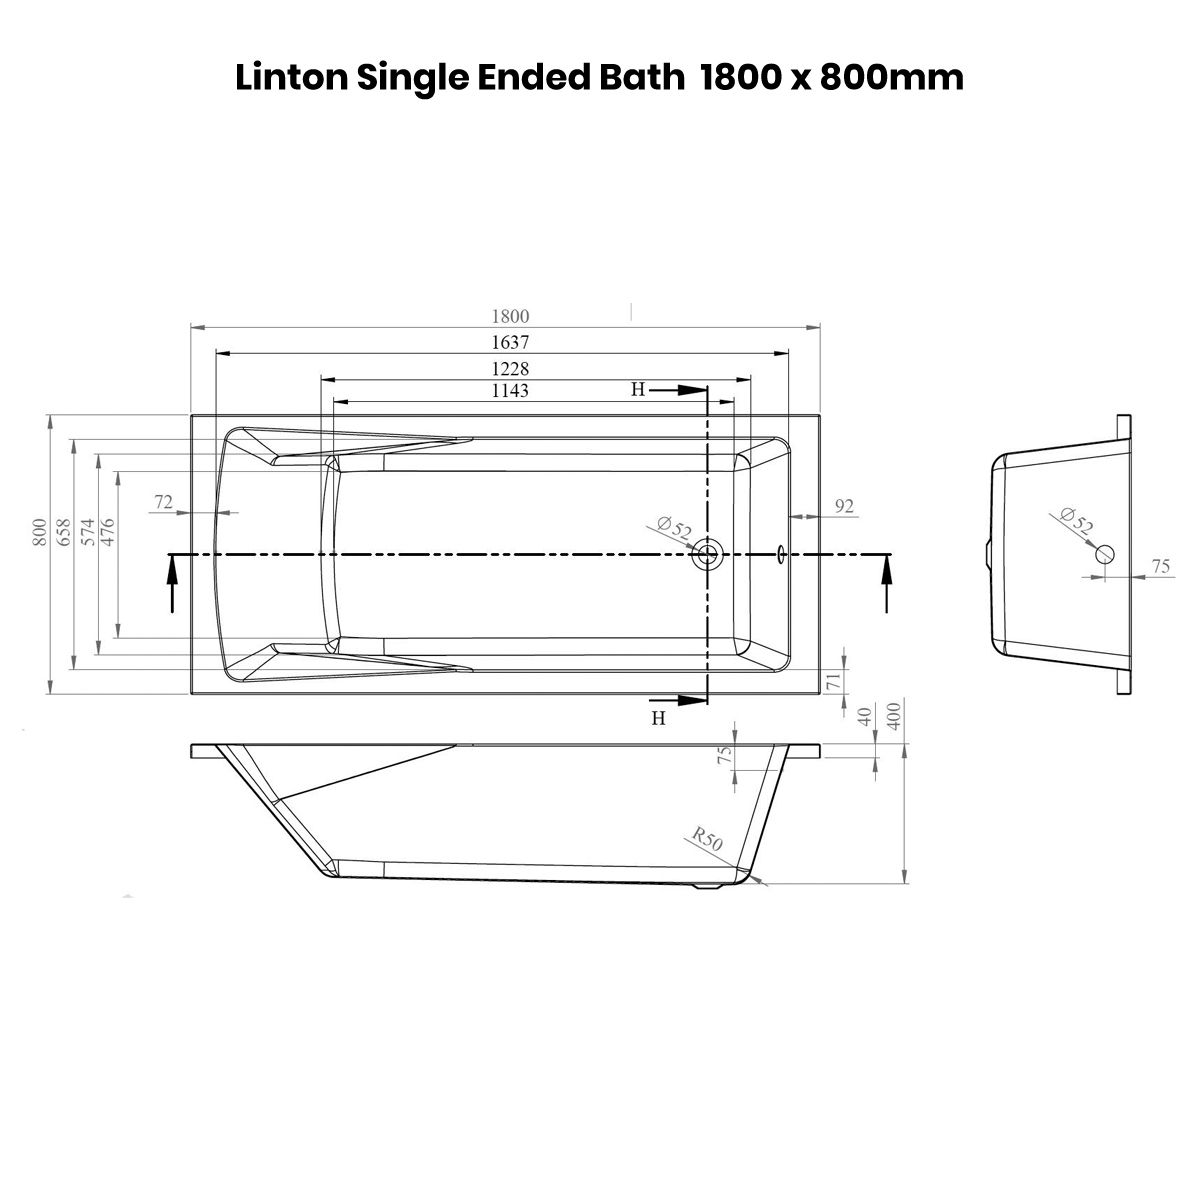 Nuie Linton Straight Shower Bath 1800 x 800mm Dimensions